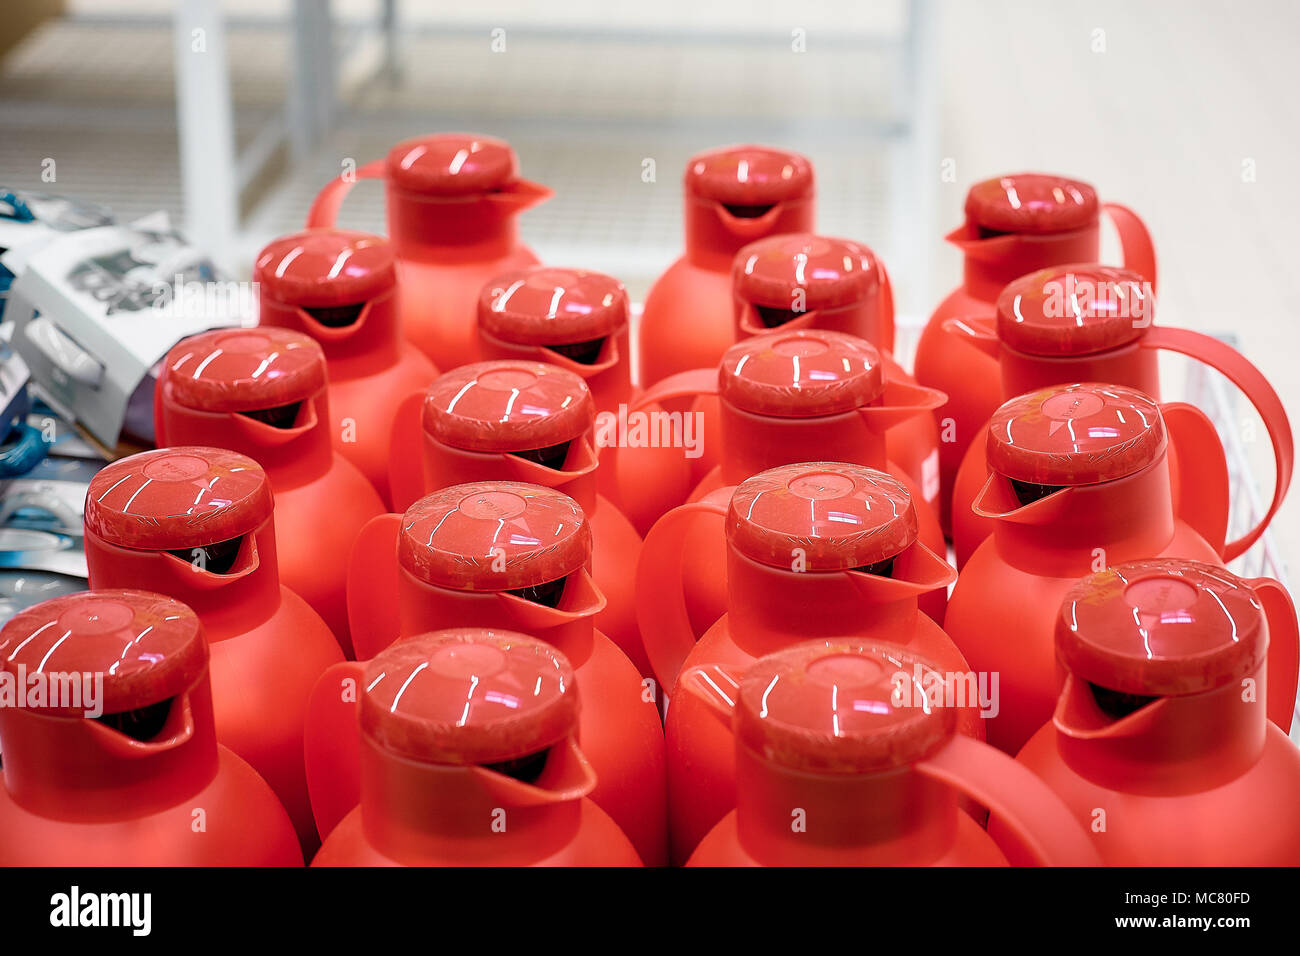 set of red plastic bottle cap isolated on white background - Stock Image